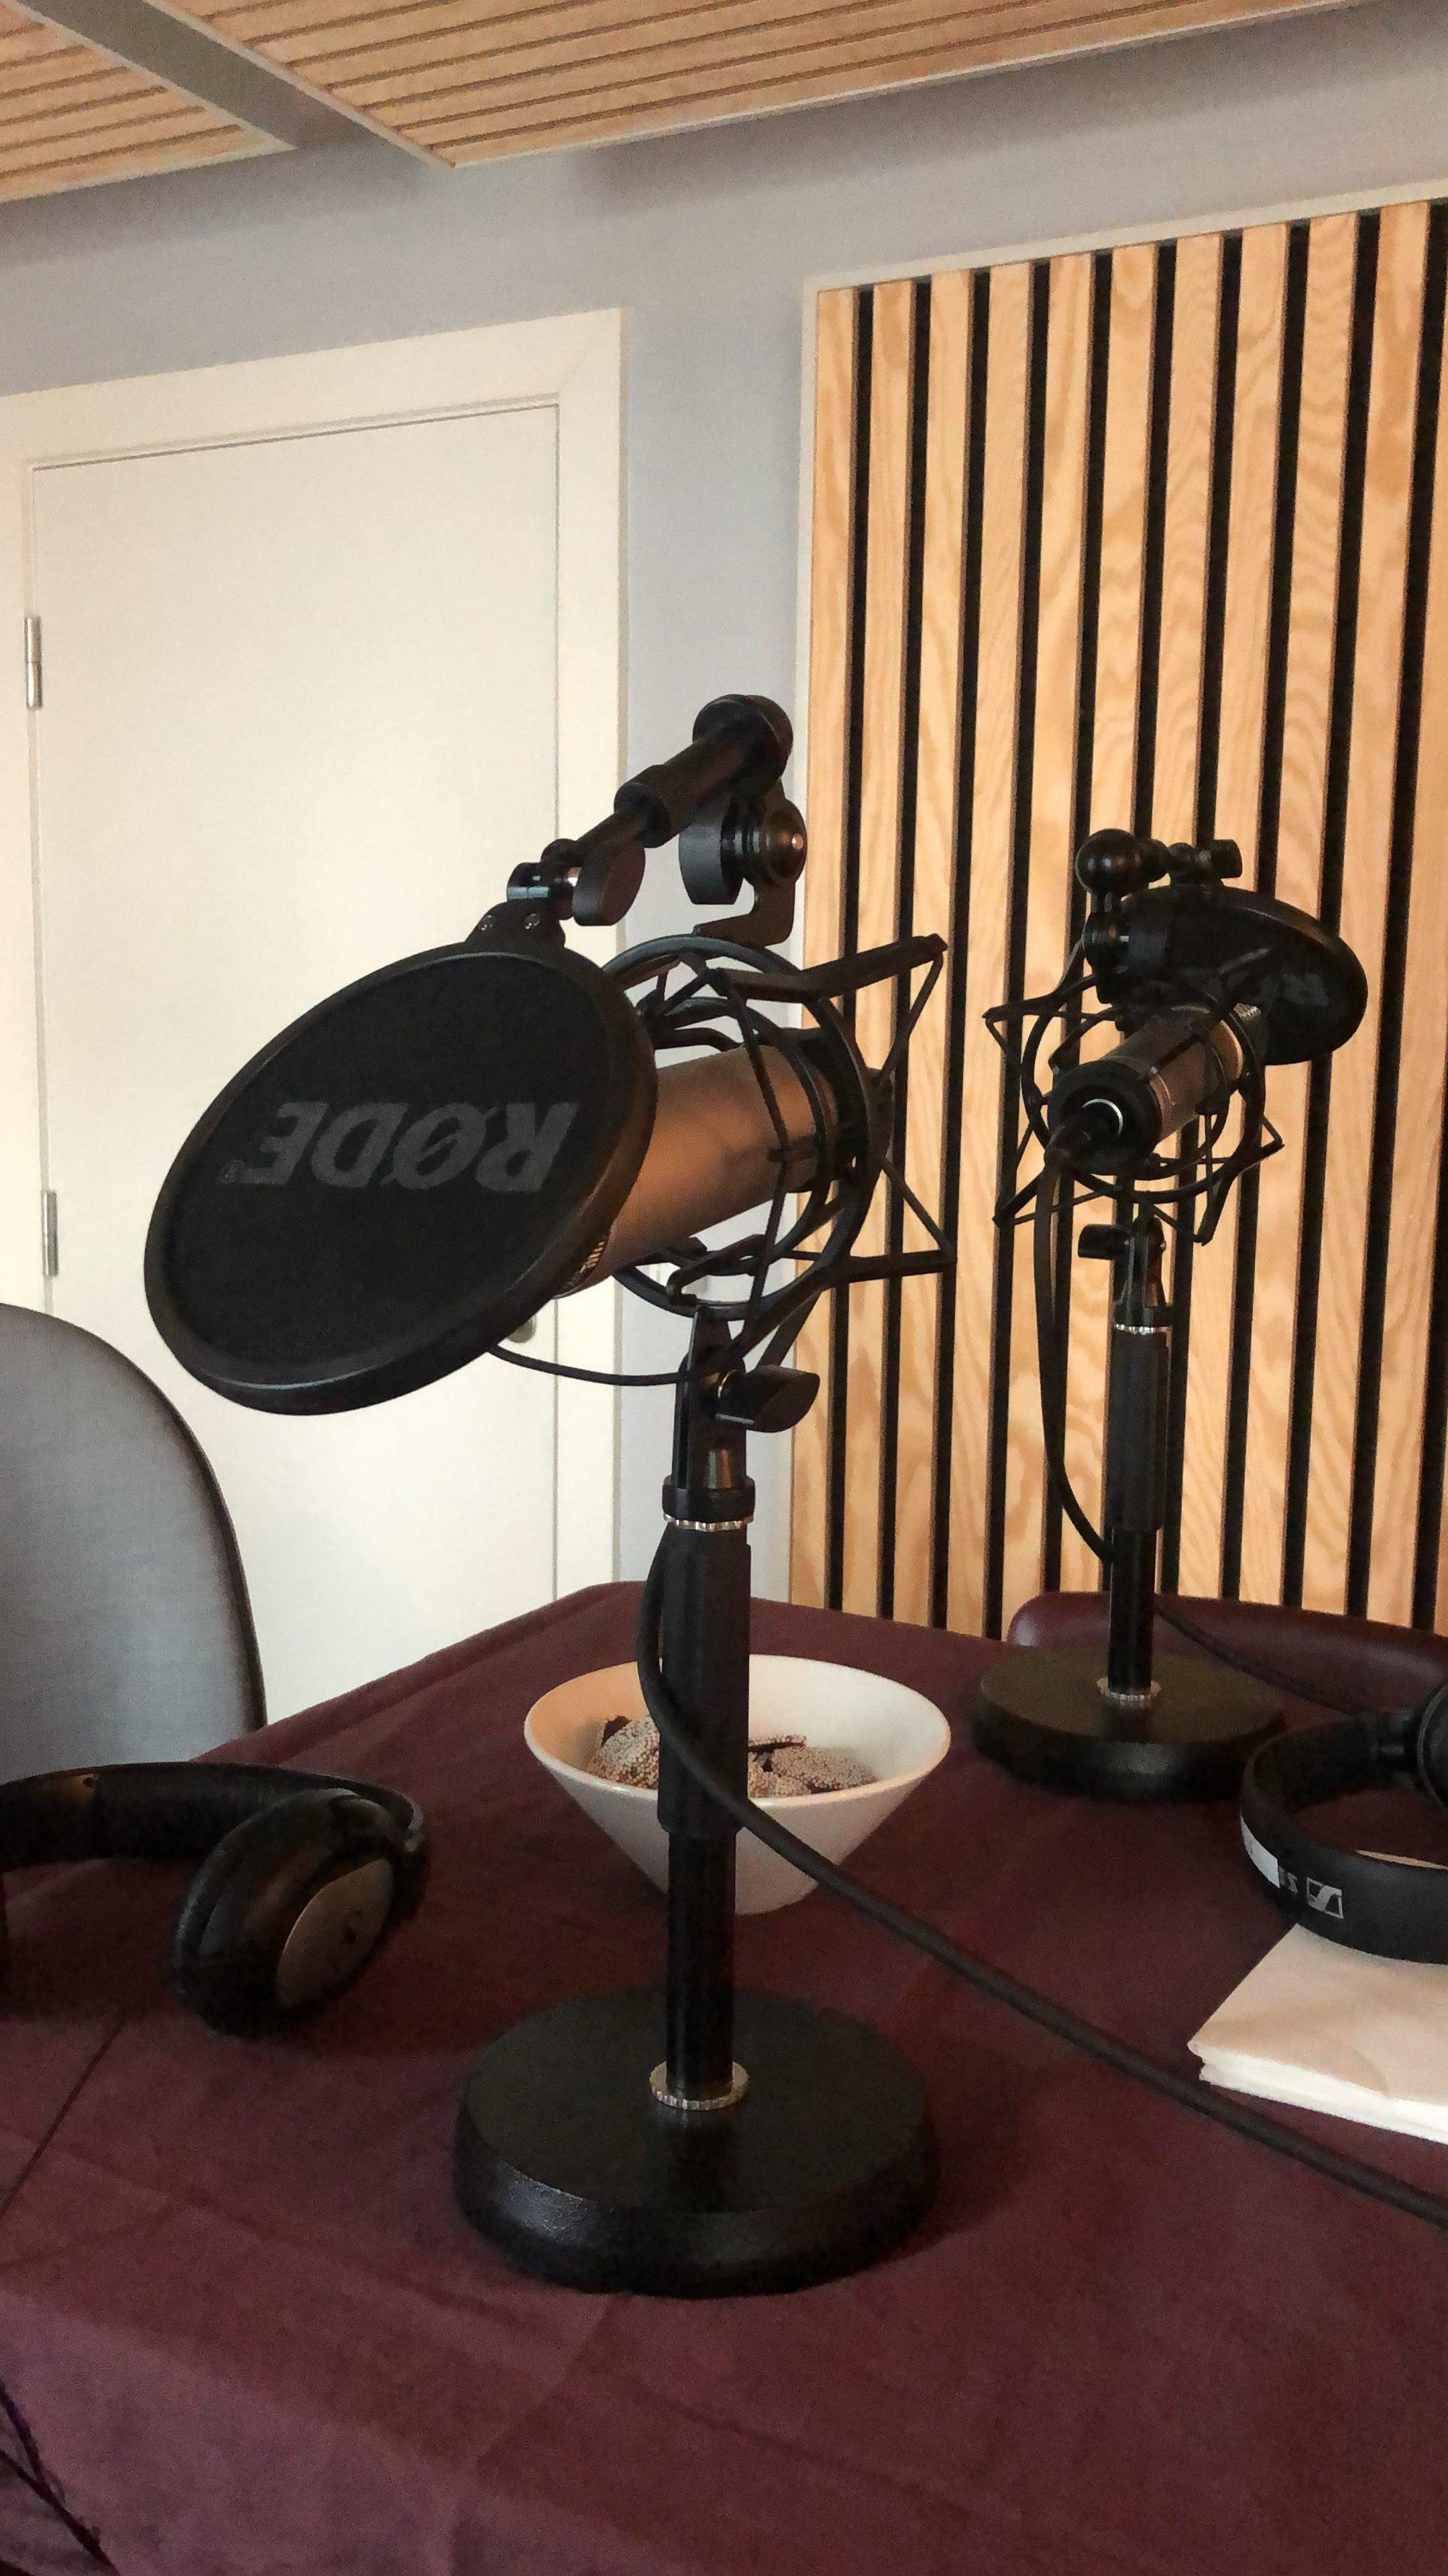 Podcast BO BEDRE Min Jul Julepodcast